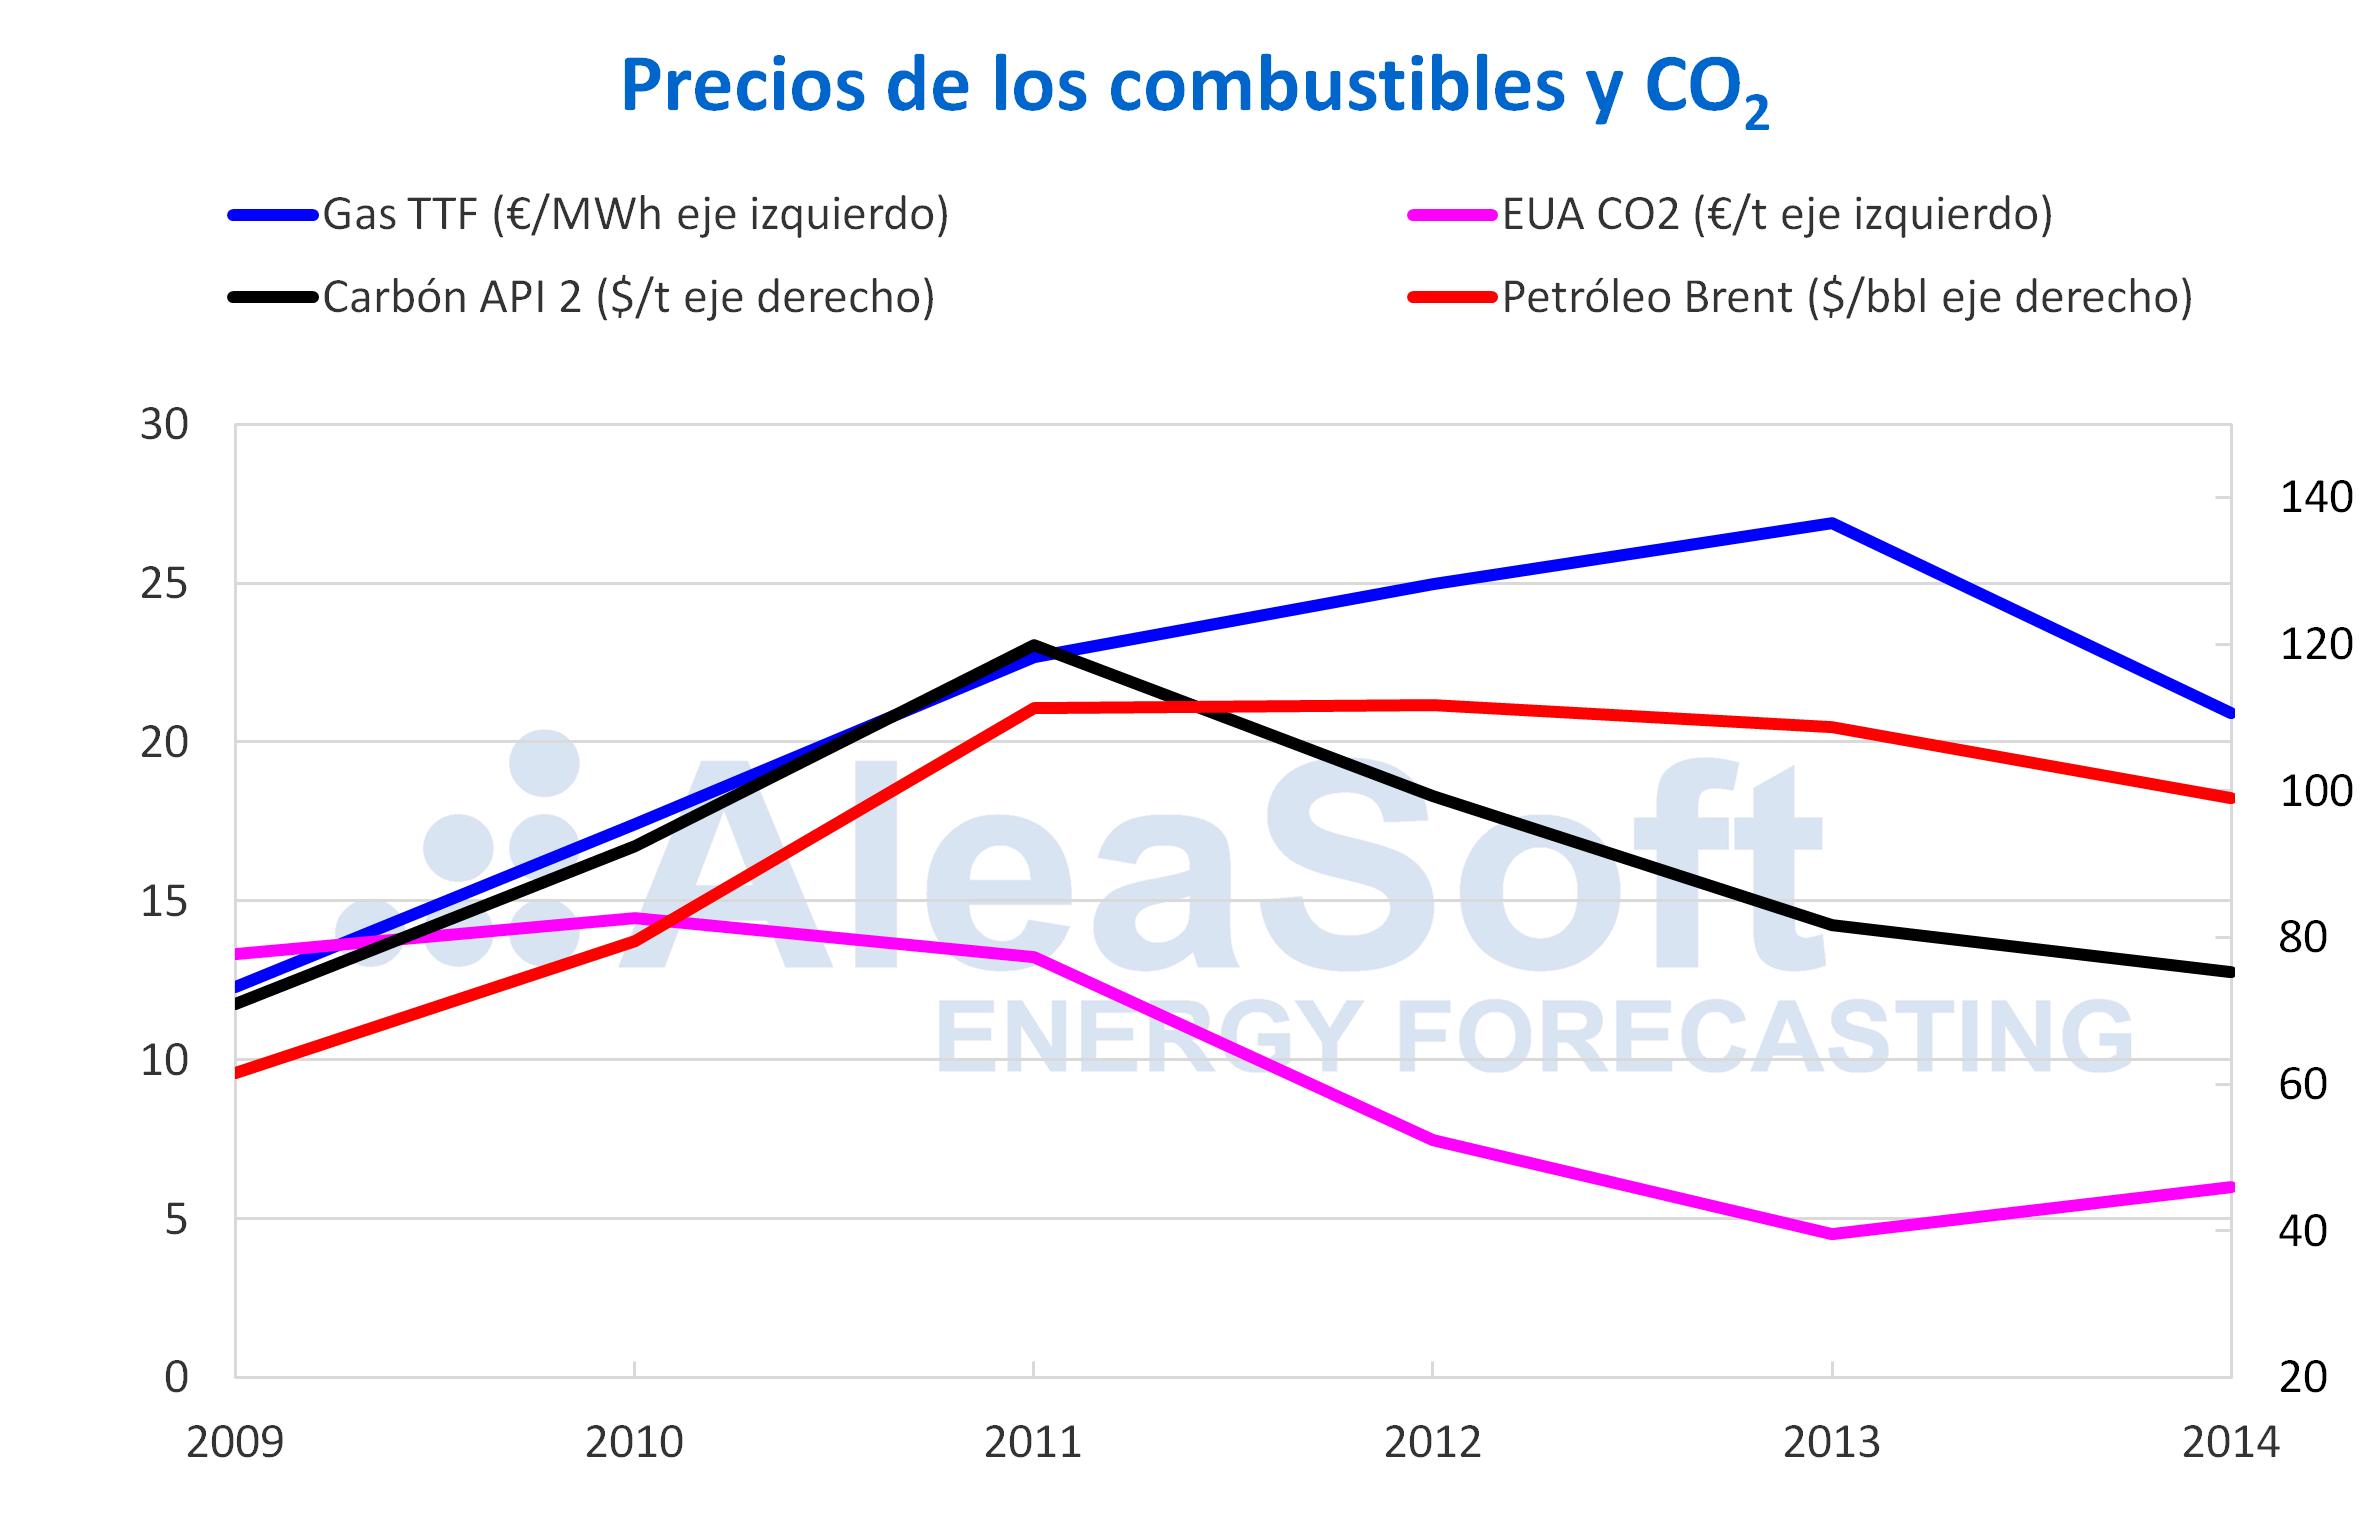 AleaSoft - Precios gas carbon brent co2 2009-2014